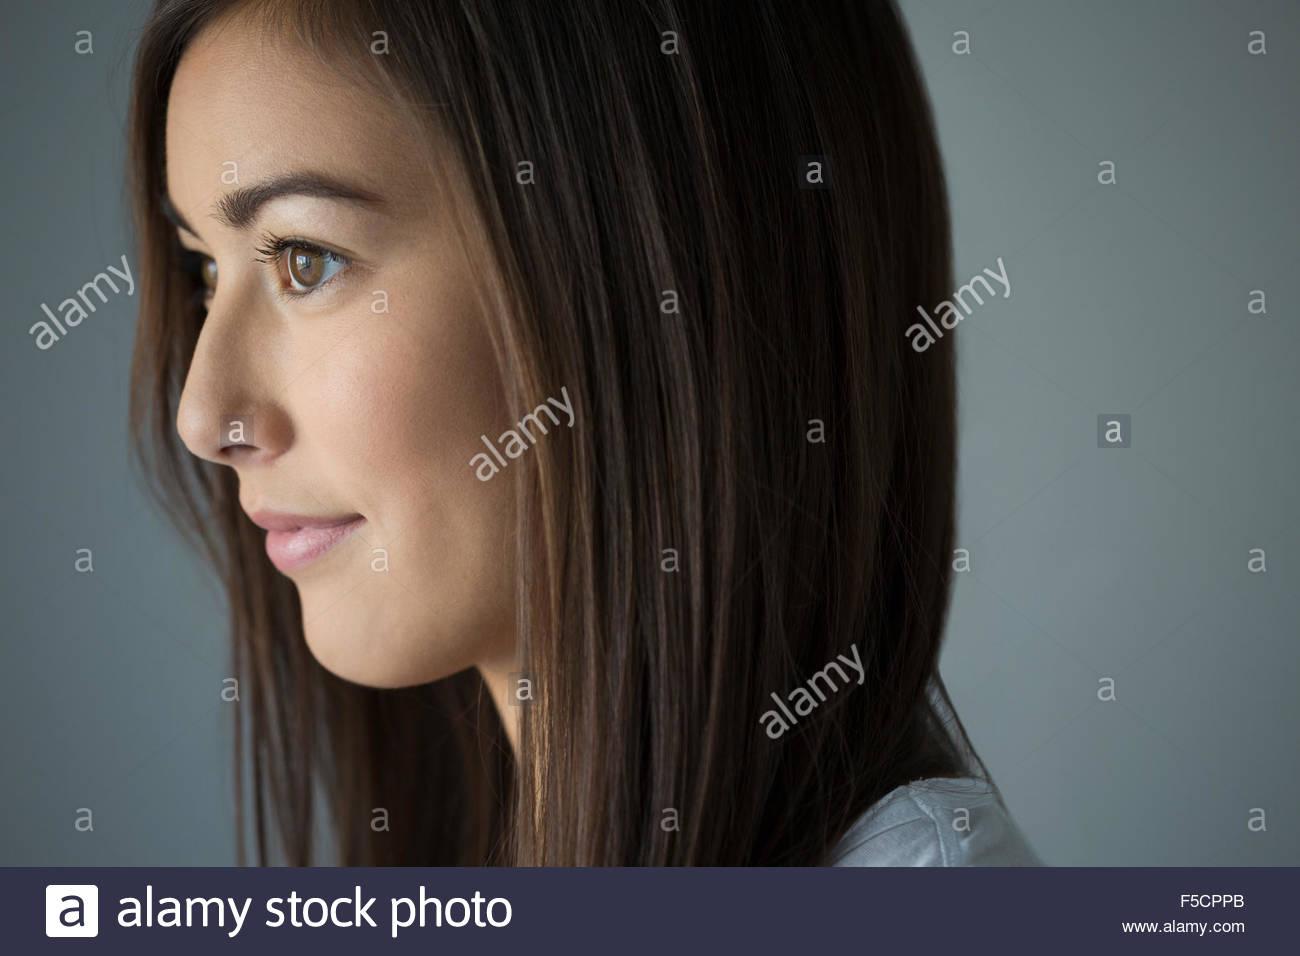 Nachdenklich Brünette junge Frau wegsehen hautnah Stockbild